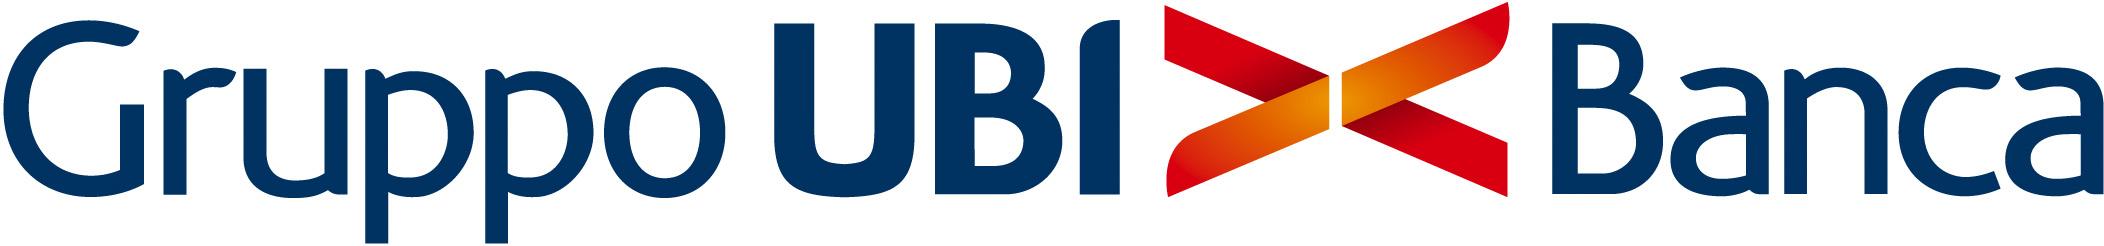 UBI BANCA Flop della settimana 8 aprile 2016